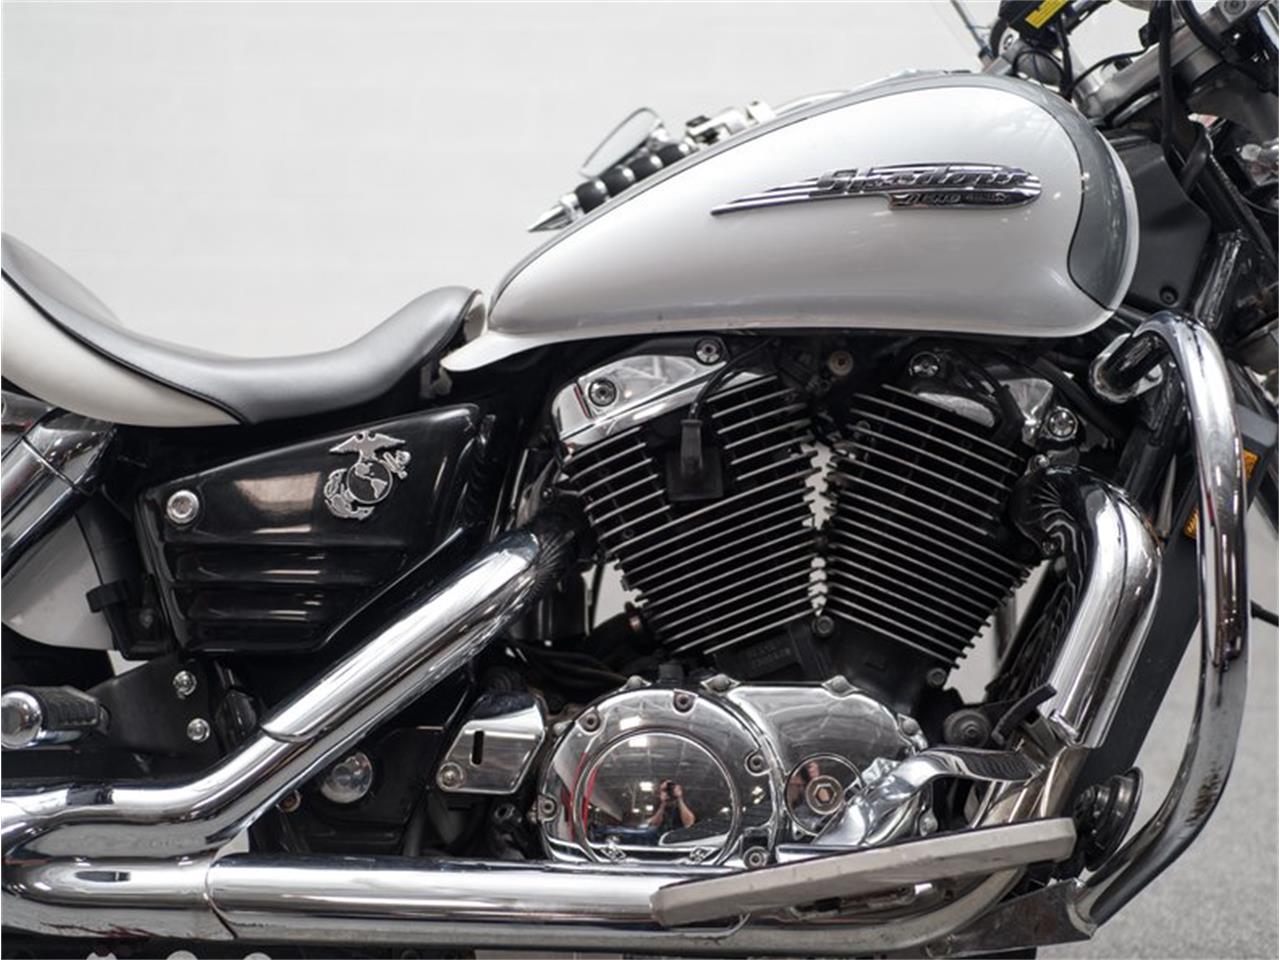 2001 Honda Motorcycle (CC-1366250) for sale in Gilbert, Arizona